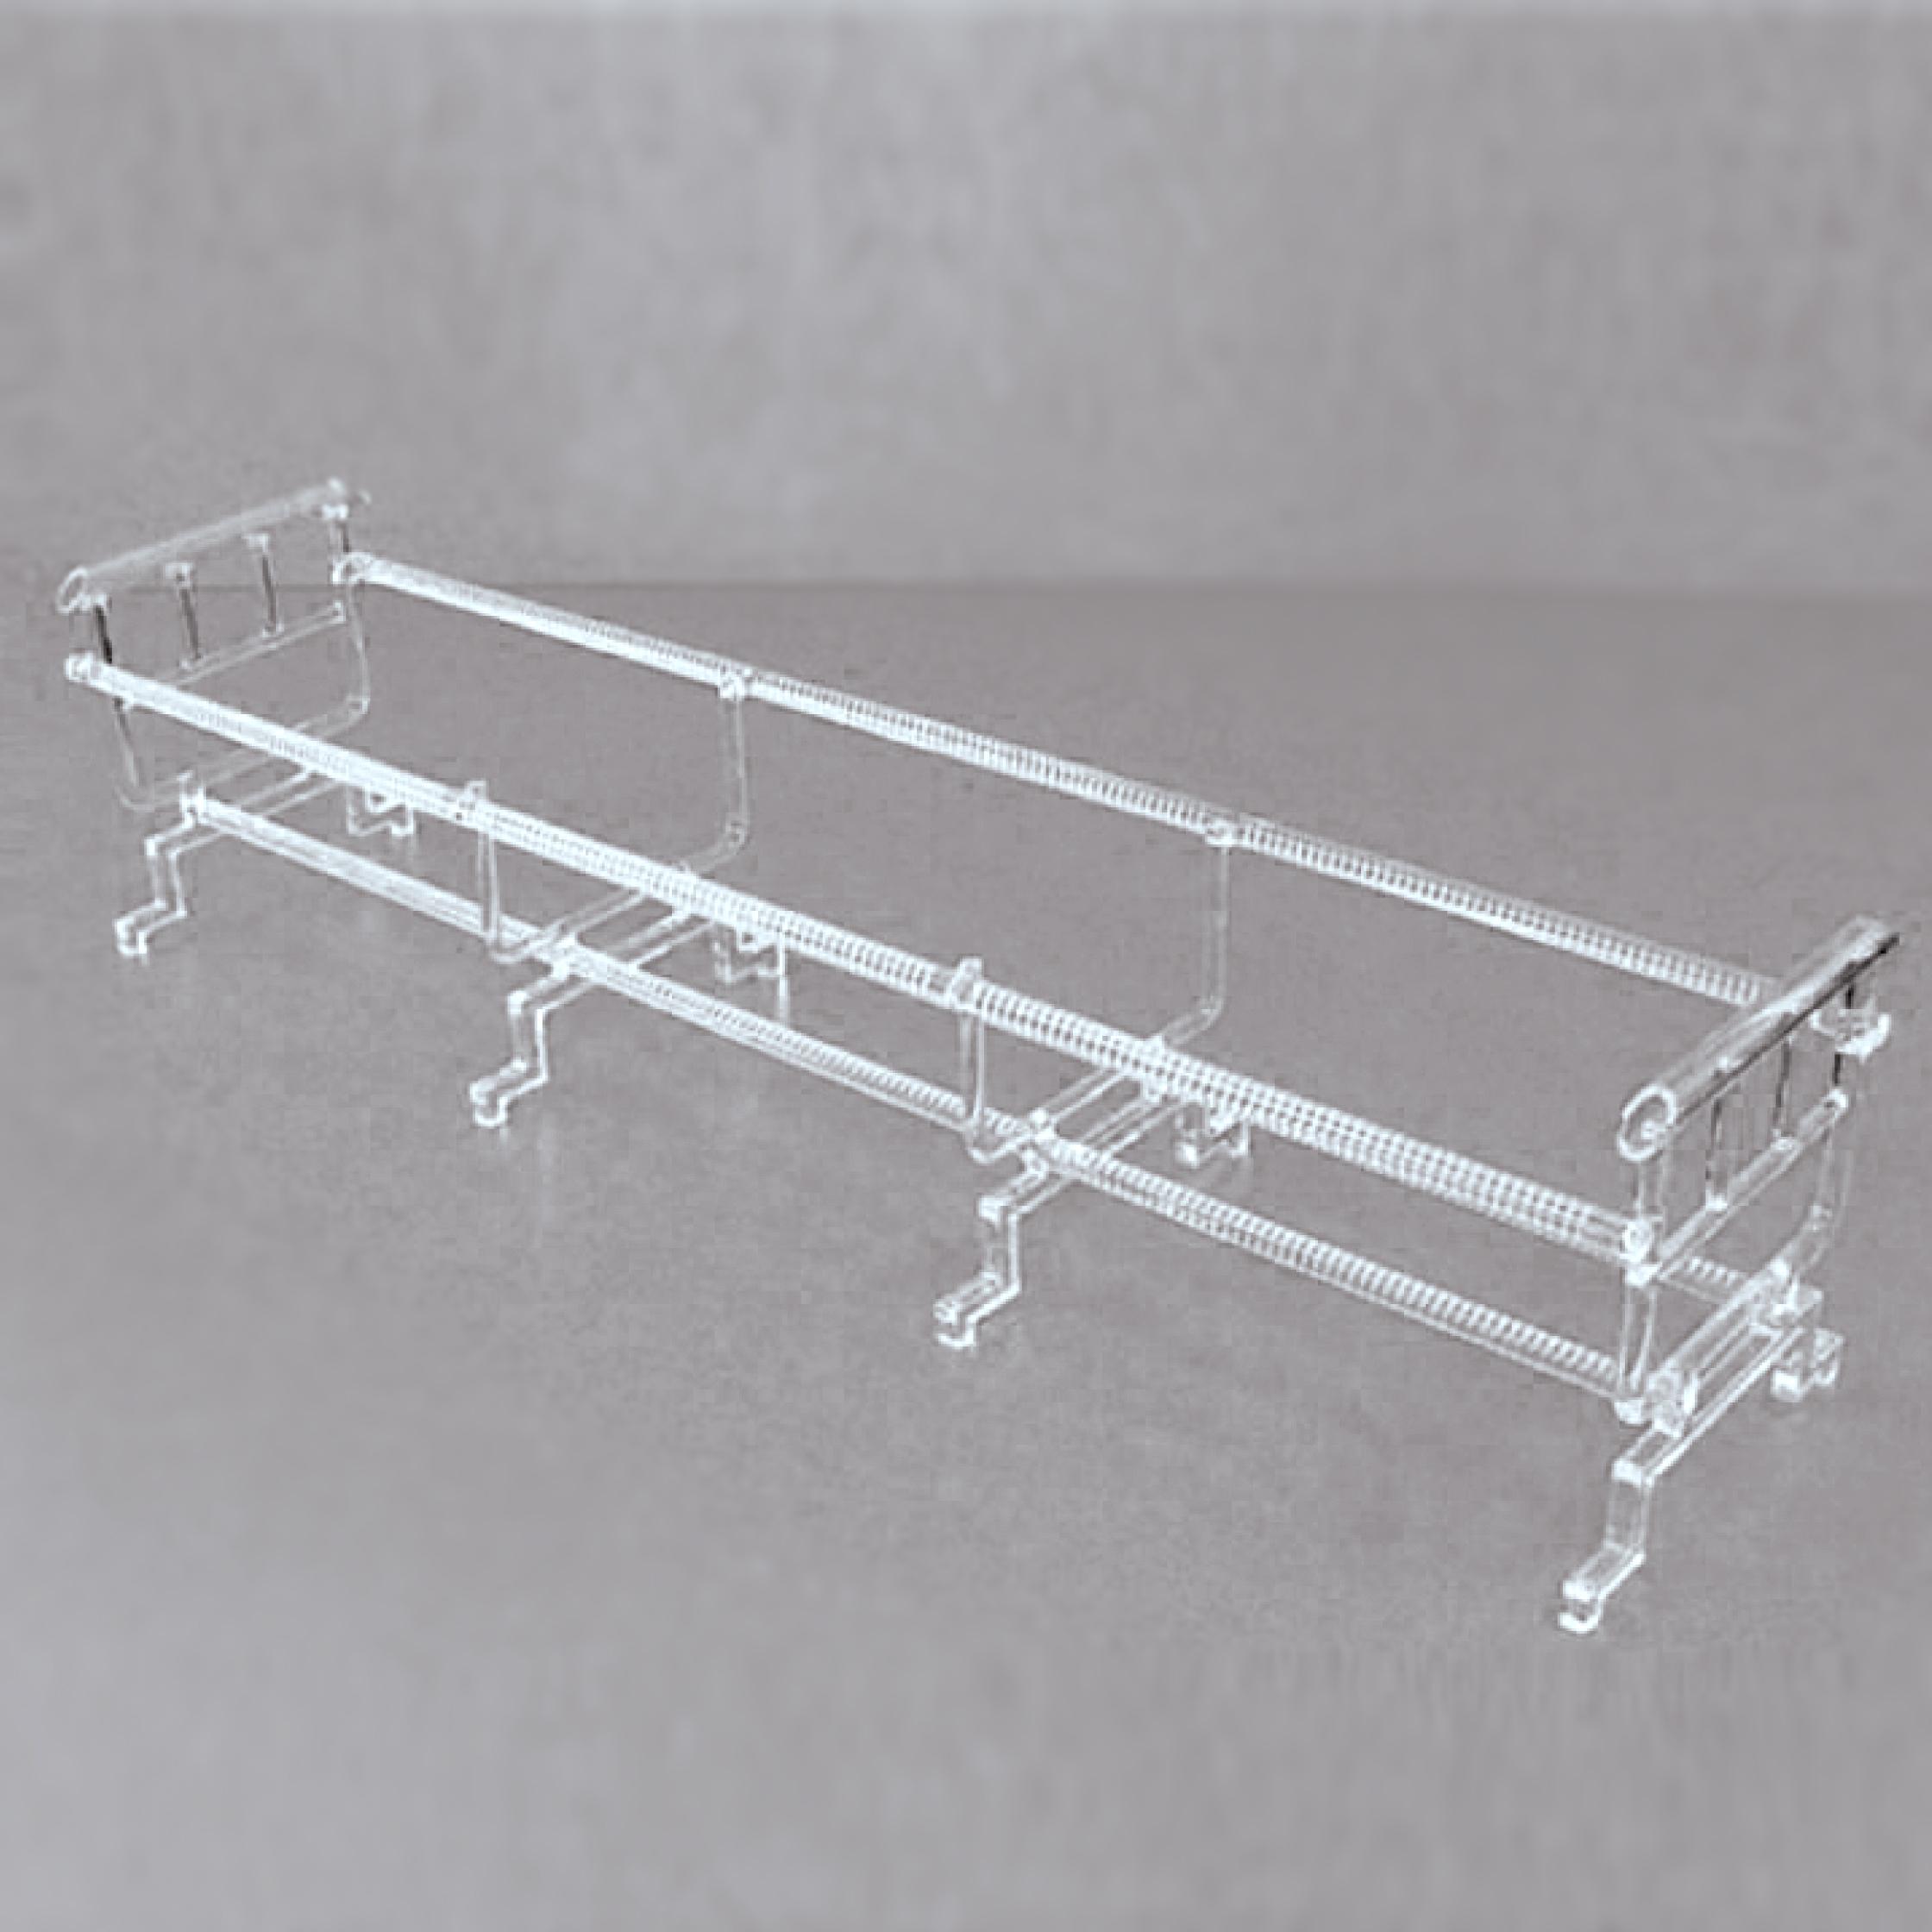 Quartz glass semiconductor products - quartz boat